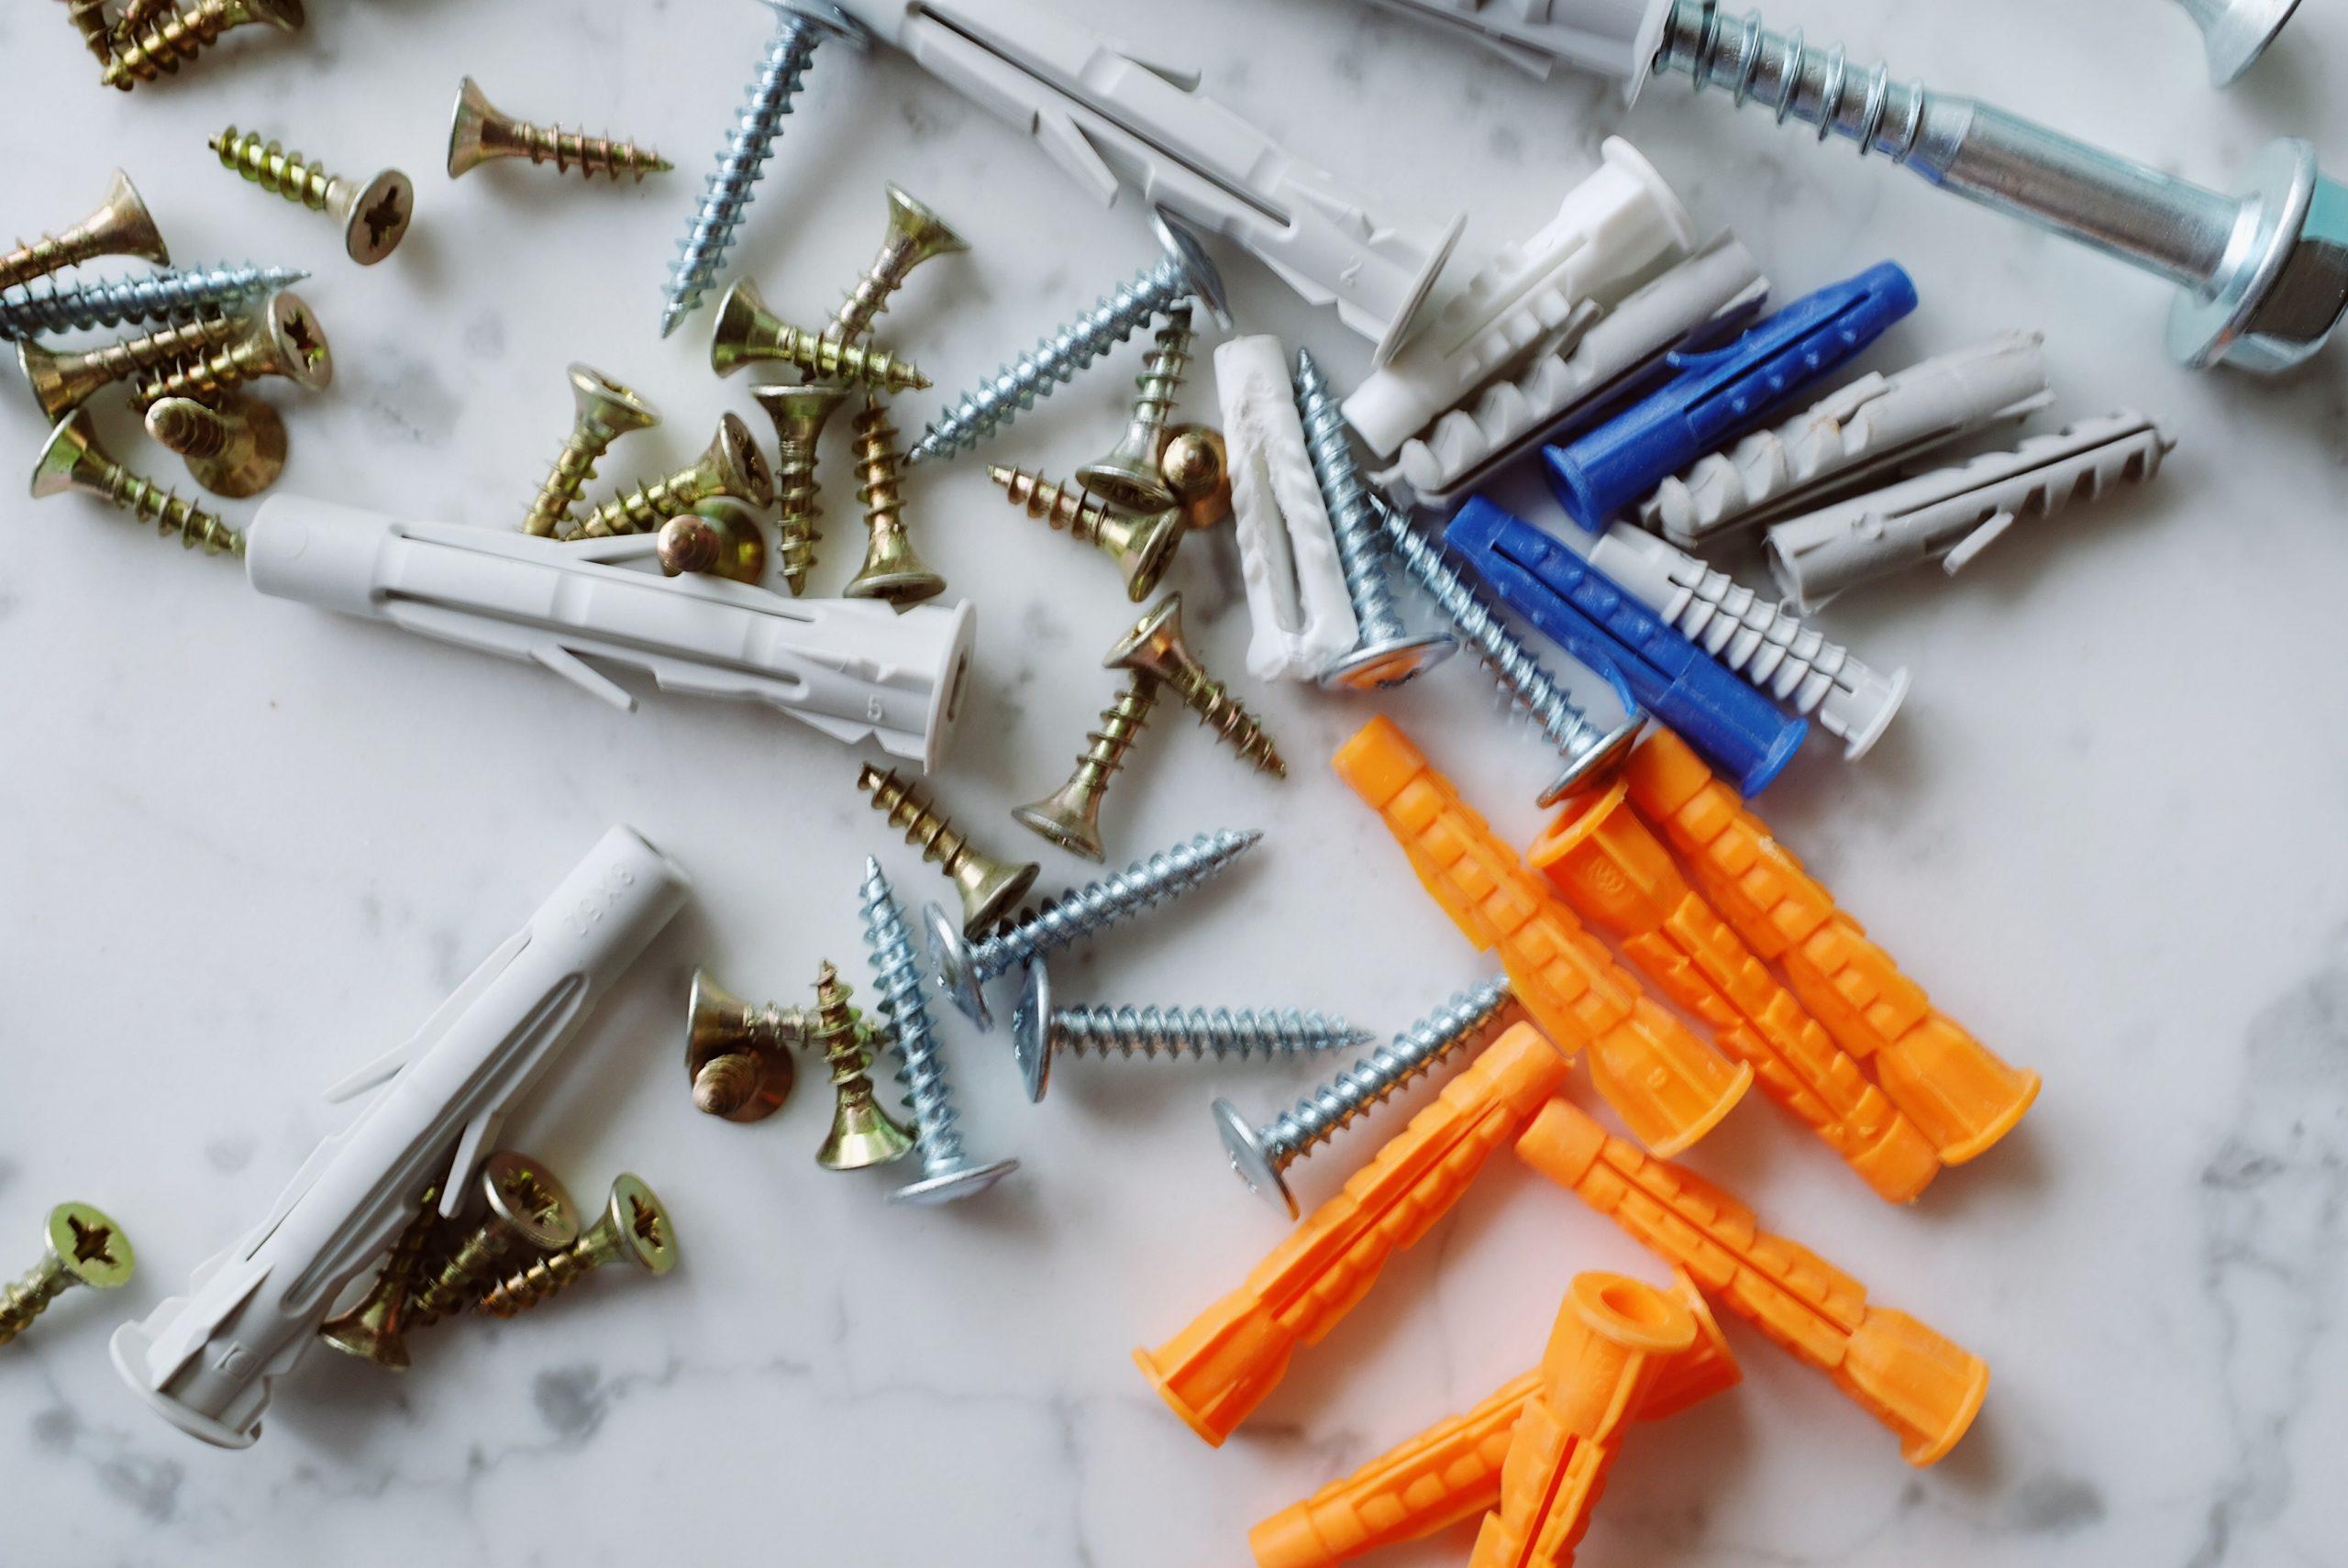 plastic multicolored dowels with metal screws